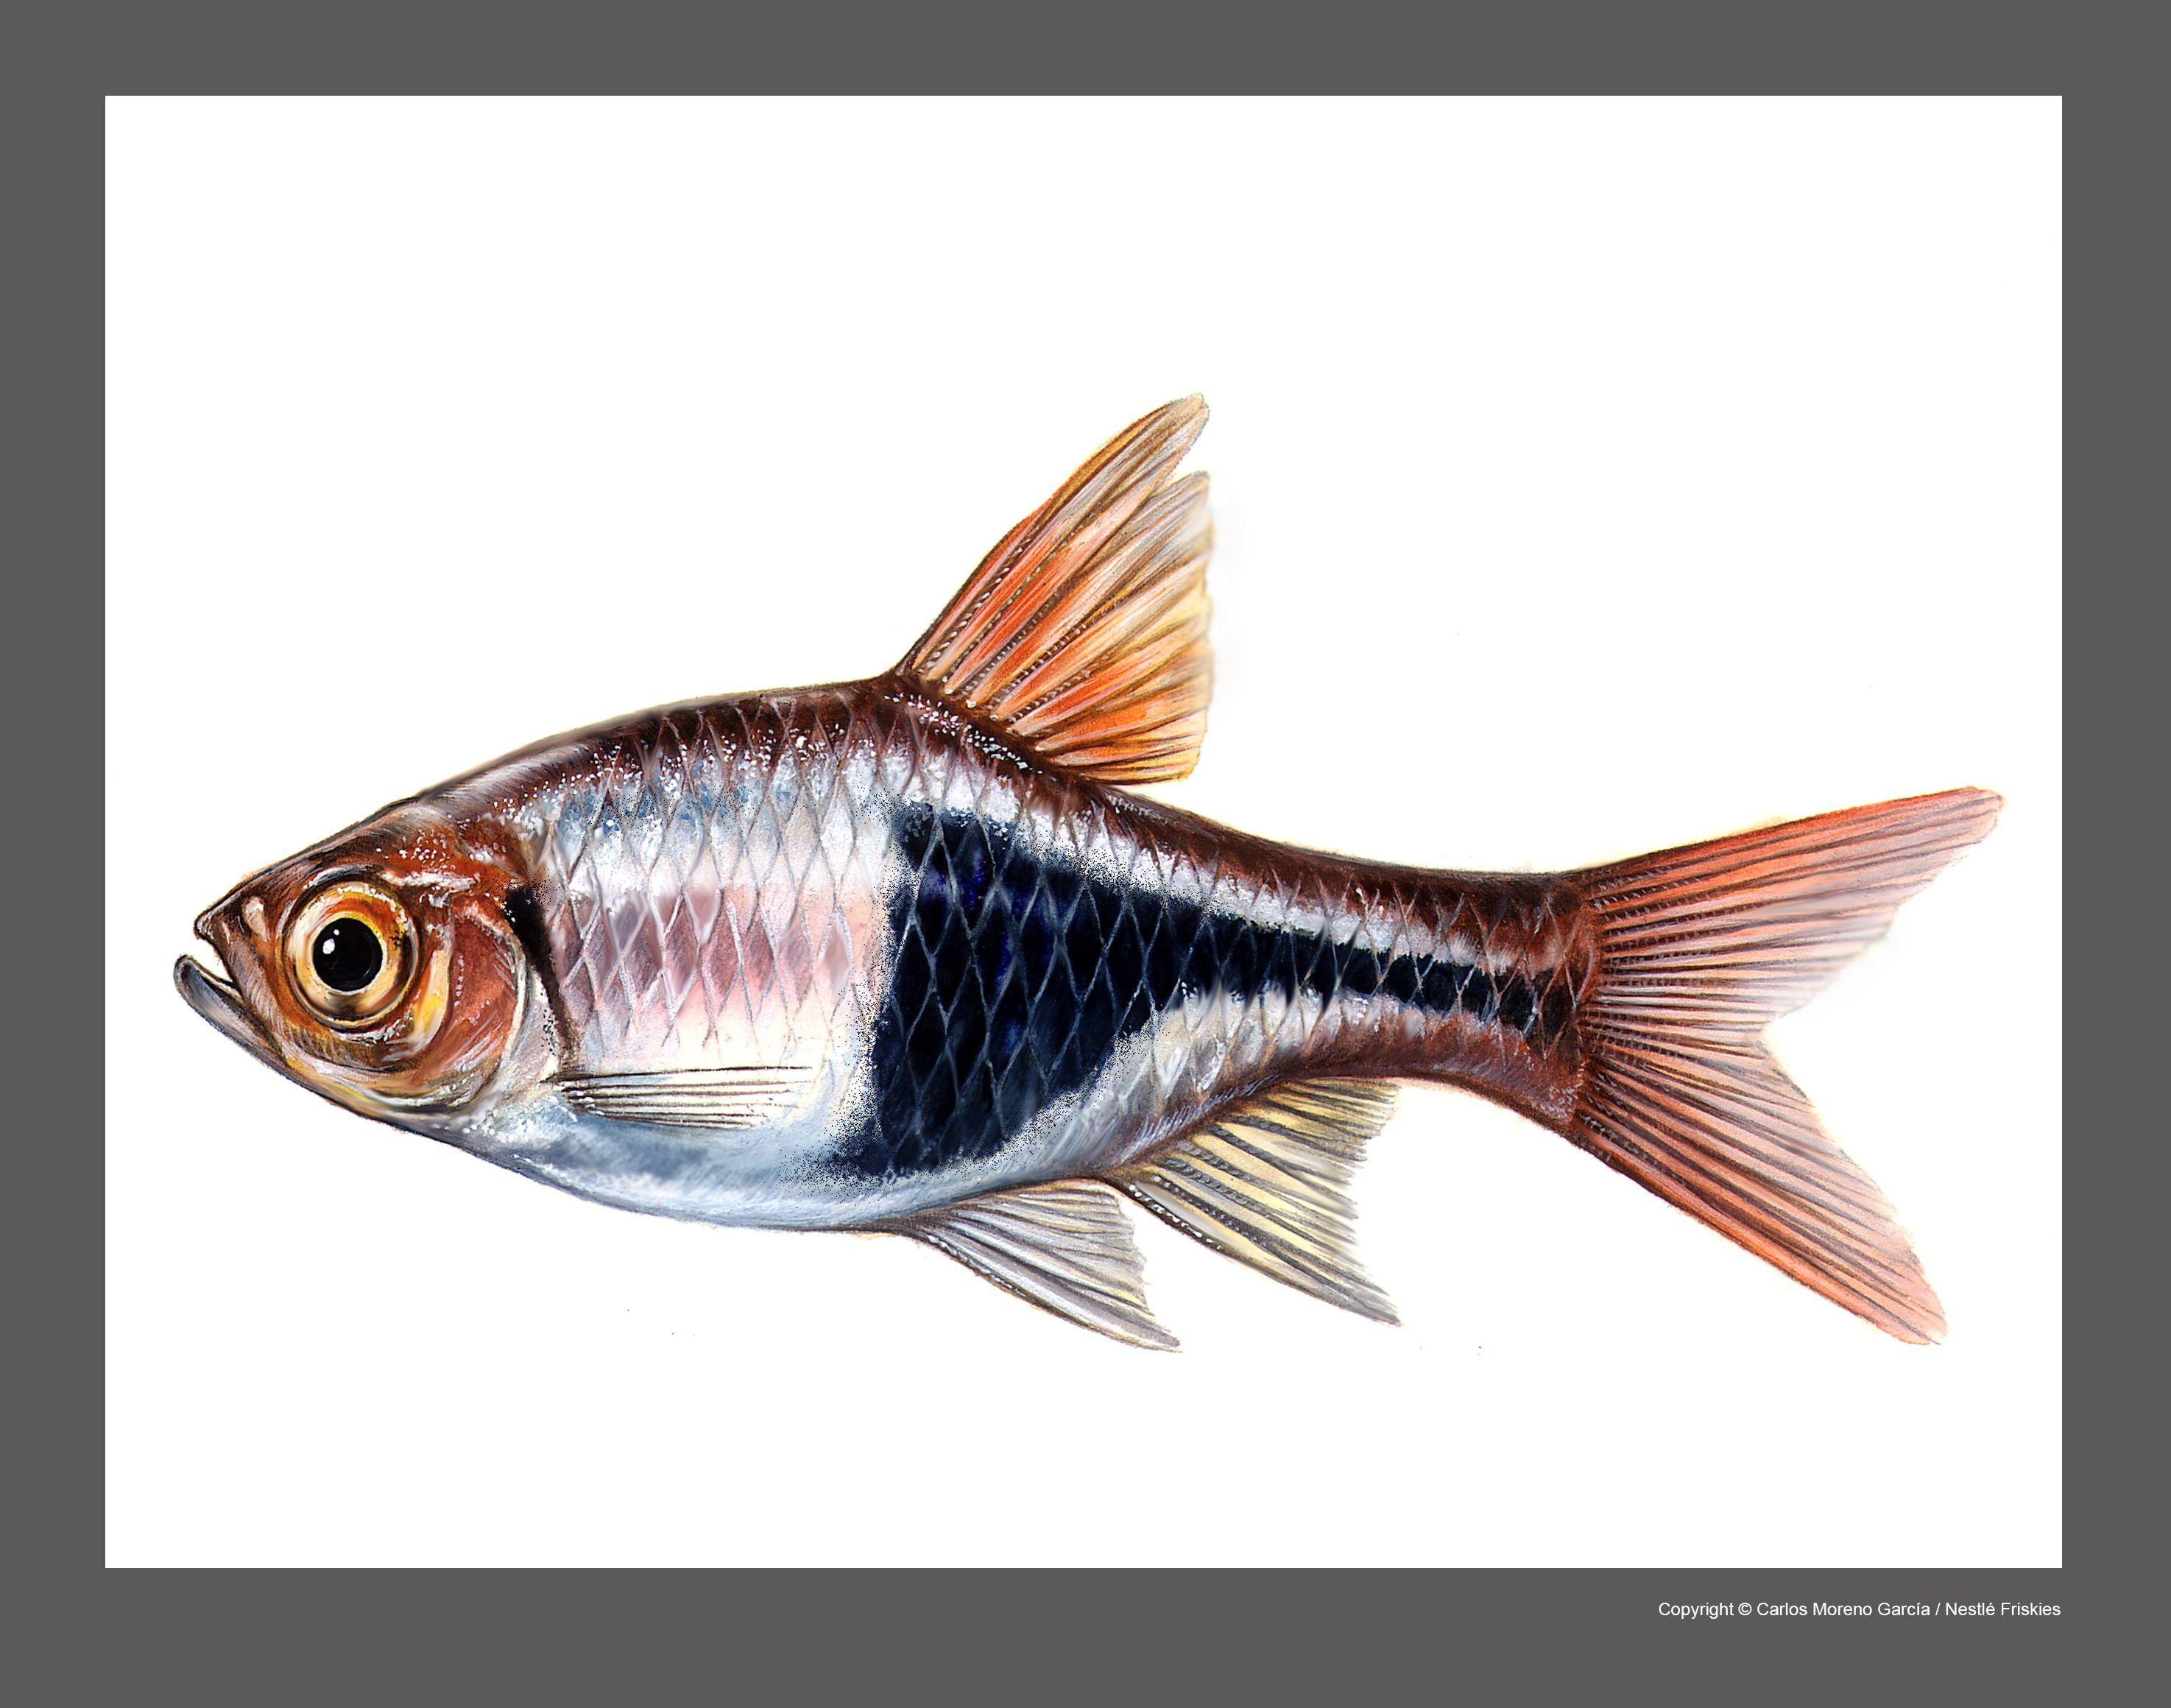 Freshwater aquarium fish from asia - Art Illustration Lakes Freshwater Fish Harlequin Rasbora Trigonostigma Heteromorpha